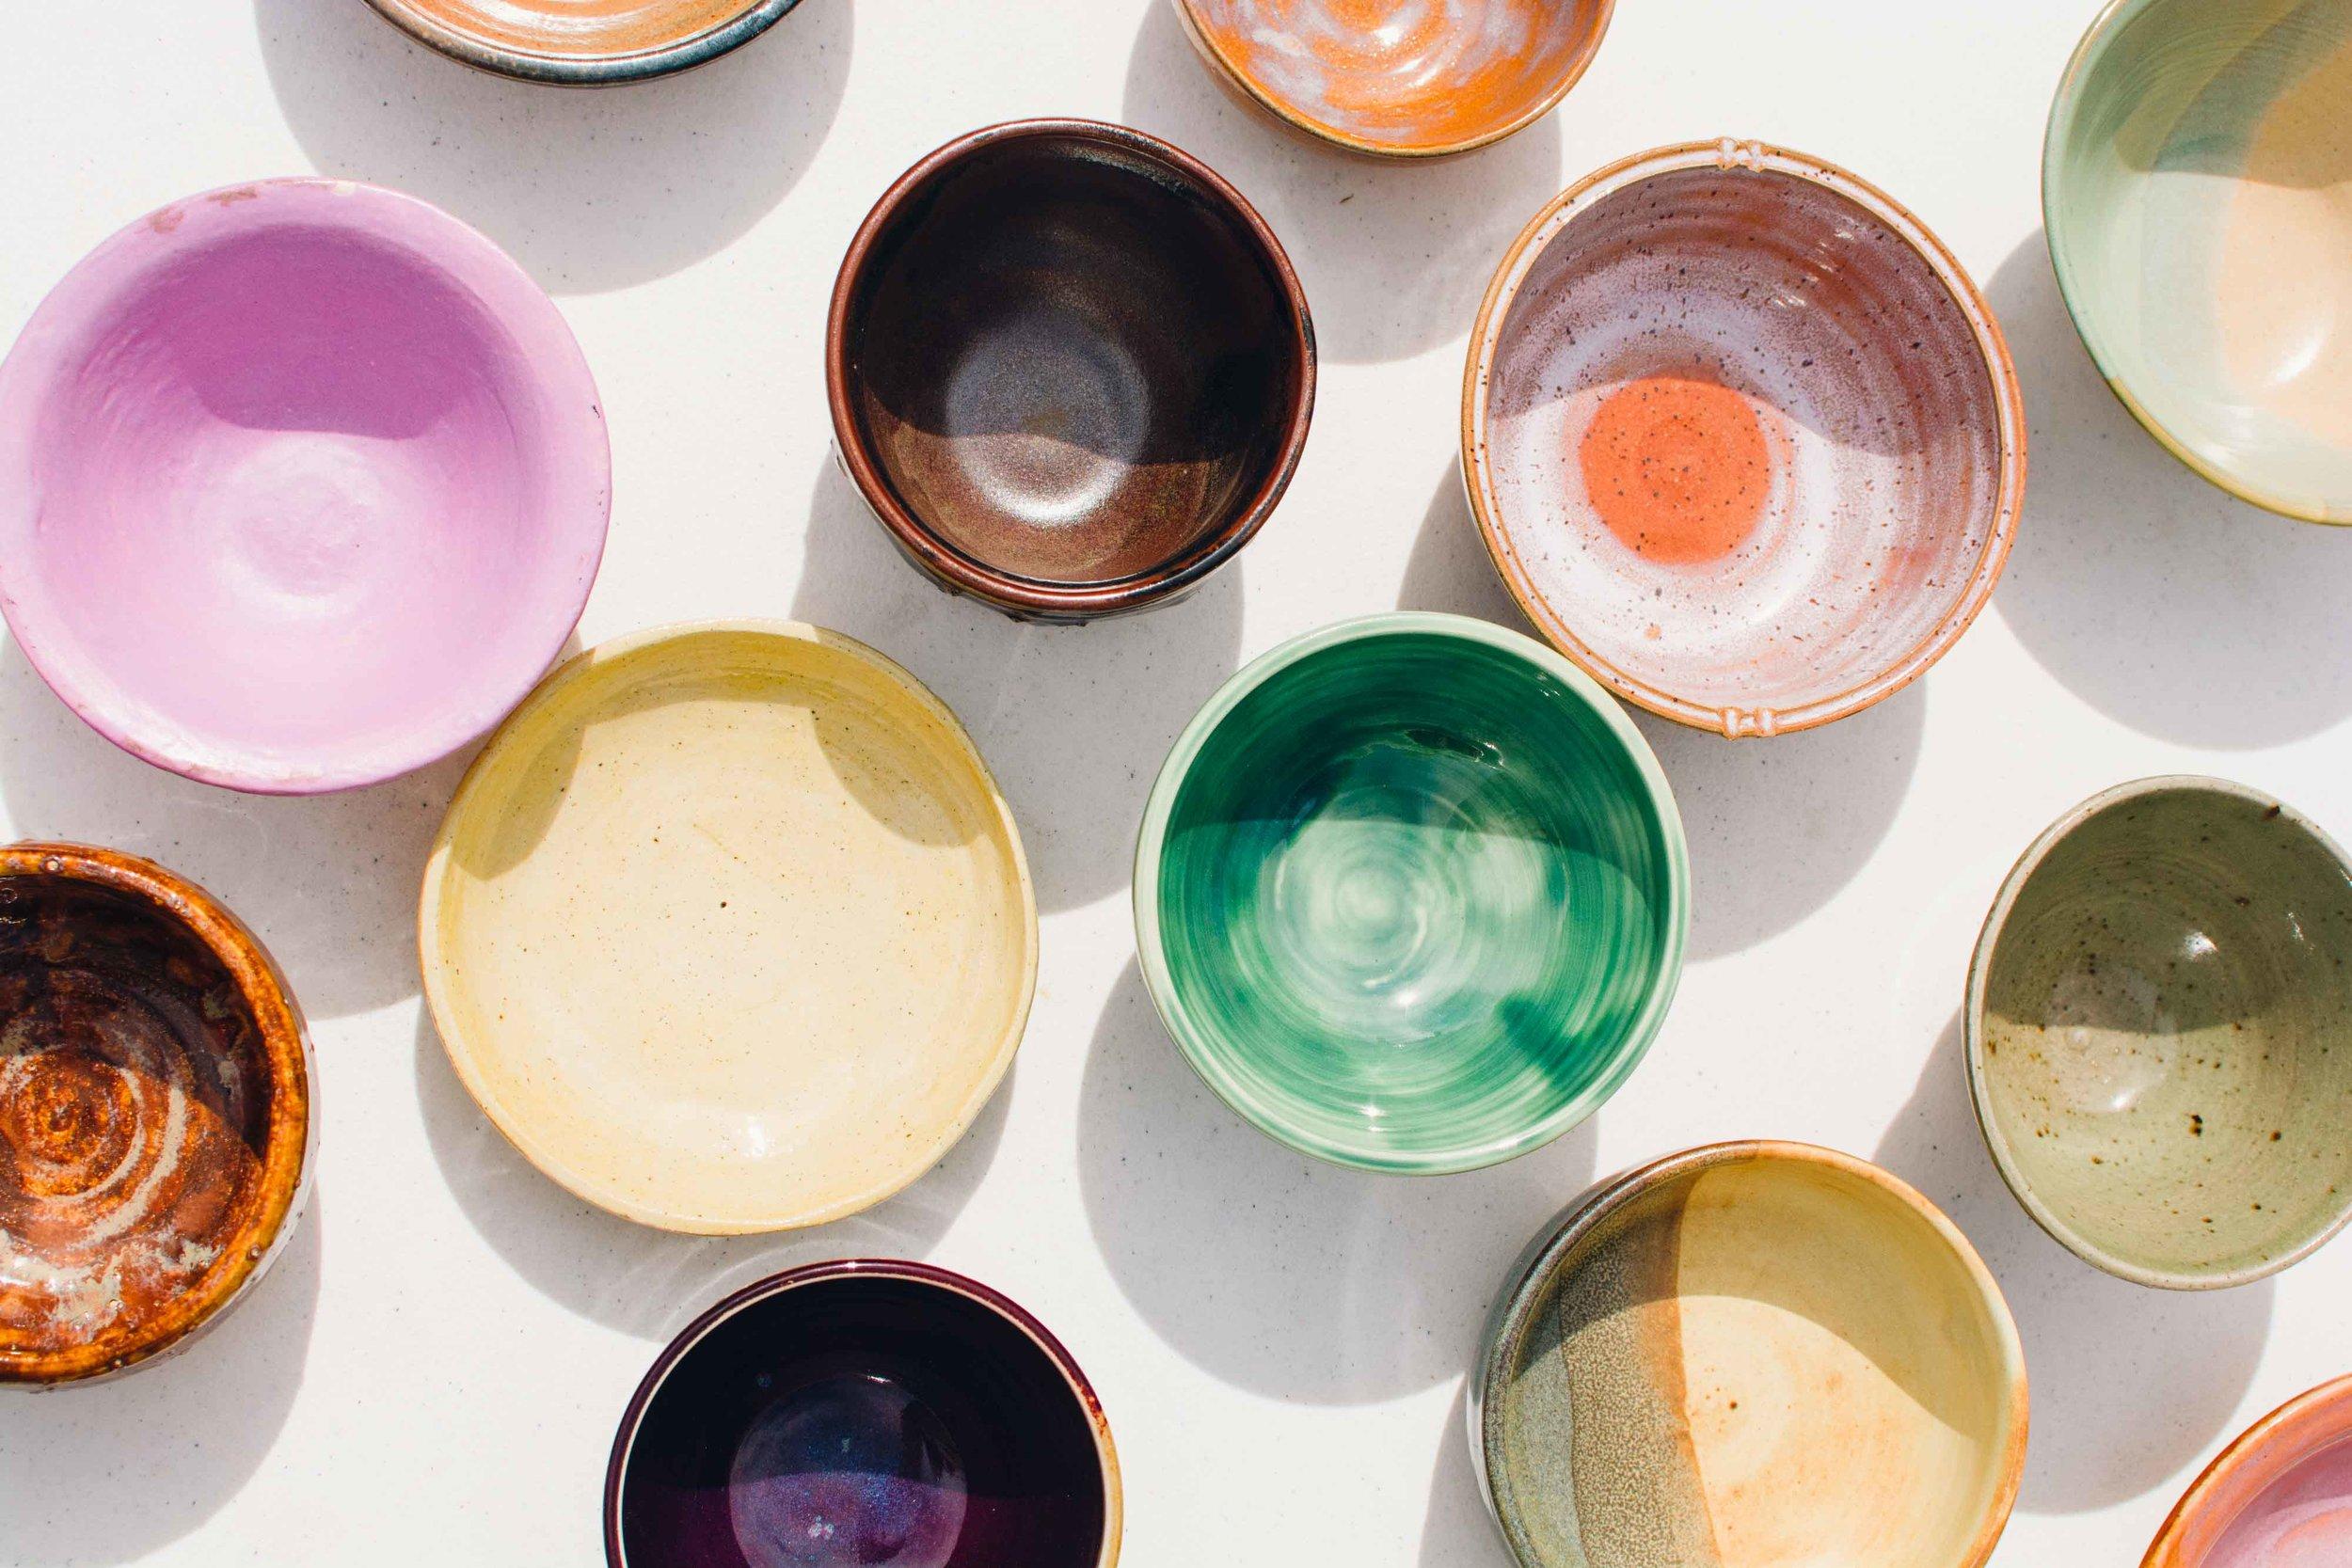 emptybowls-2-2.jpg